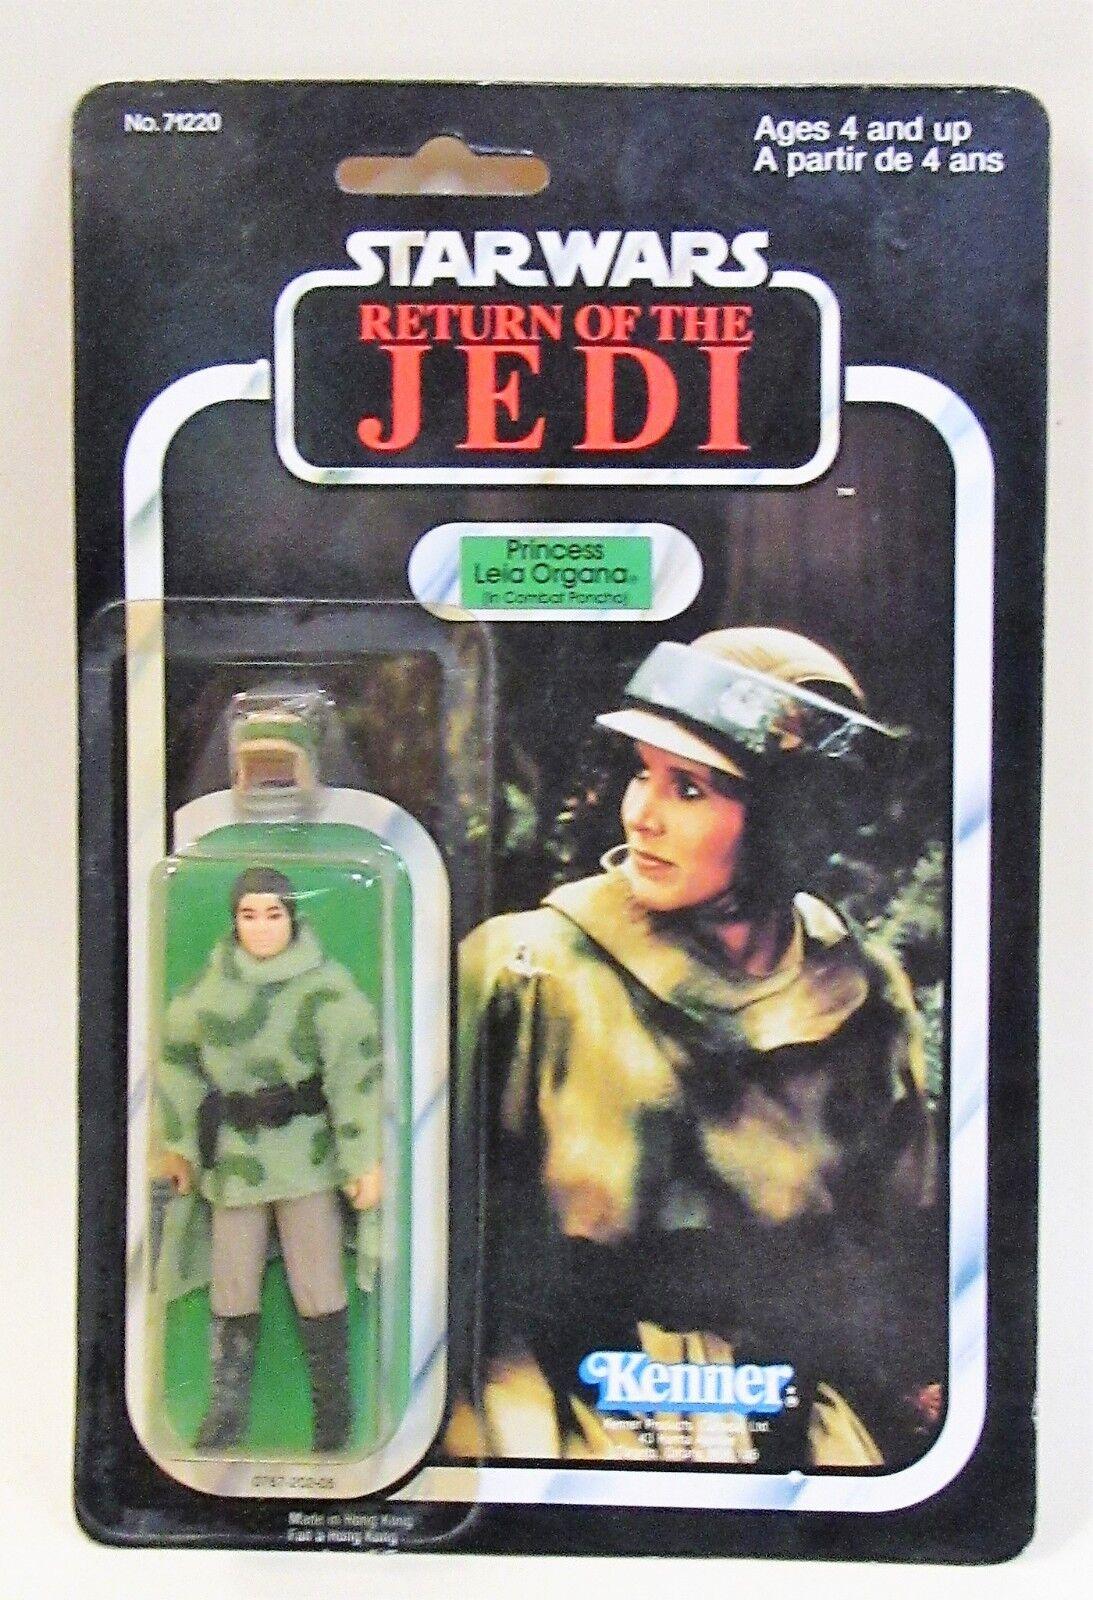 1983 Star Wars ROTJ PRINCESS LEIA ORGANA Combat Pancho figure CANADIAN MOC